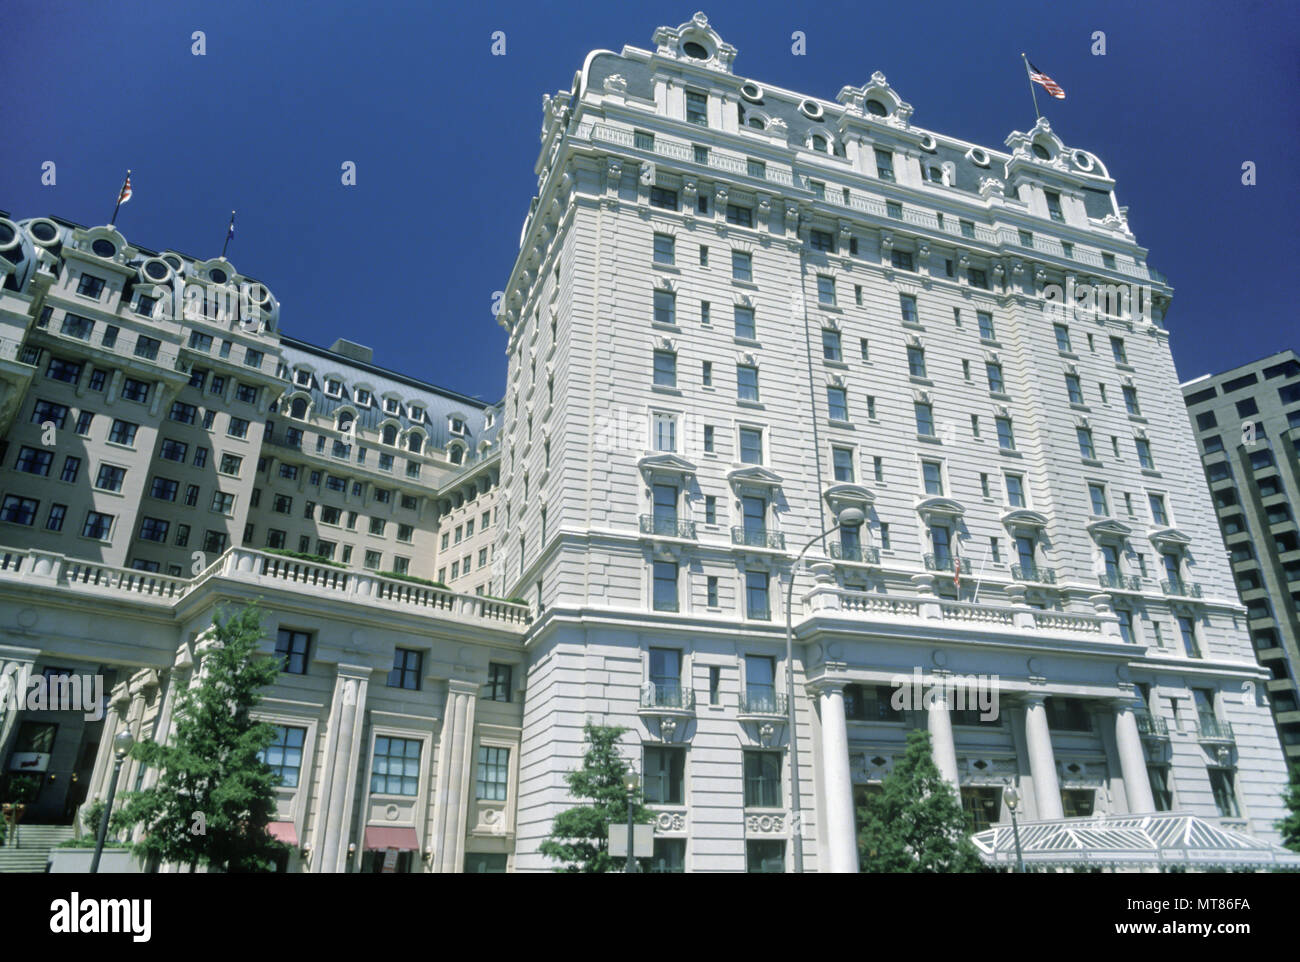 1988 HISTORICAL WILLARD HOTEL PENNSYLVANIA AVENUE WASHINGTON DC USA - Stock Image